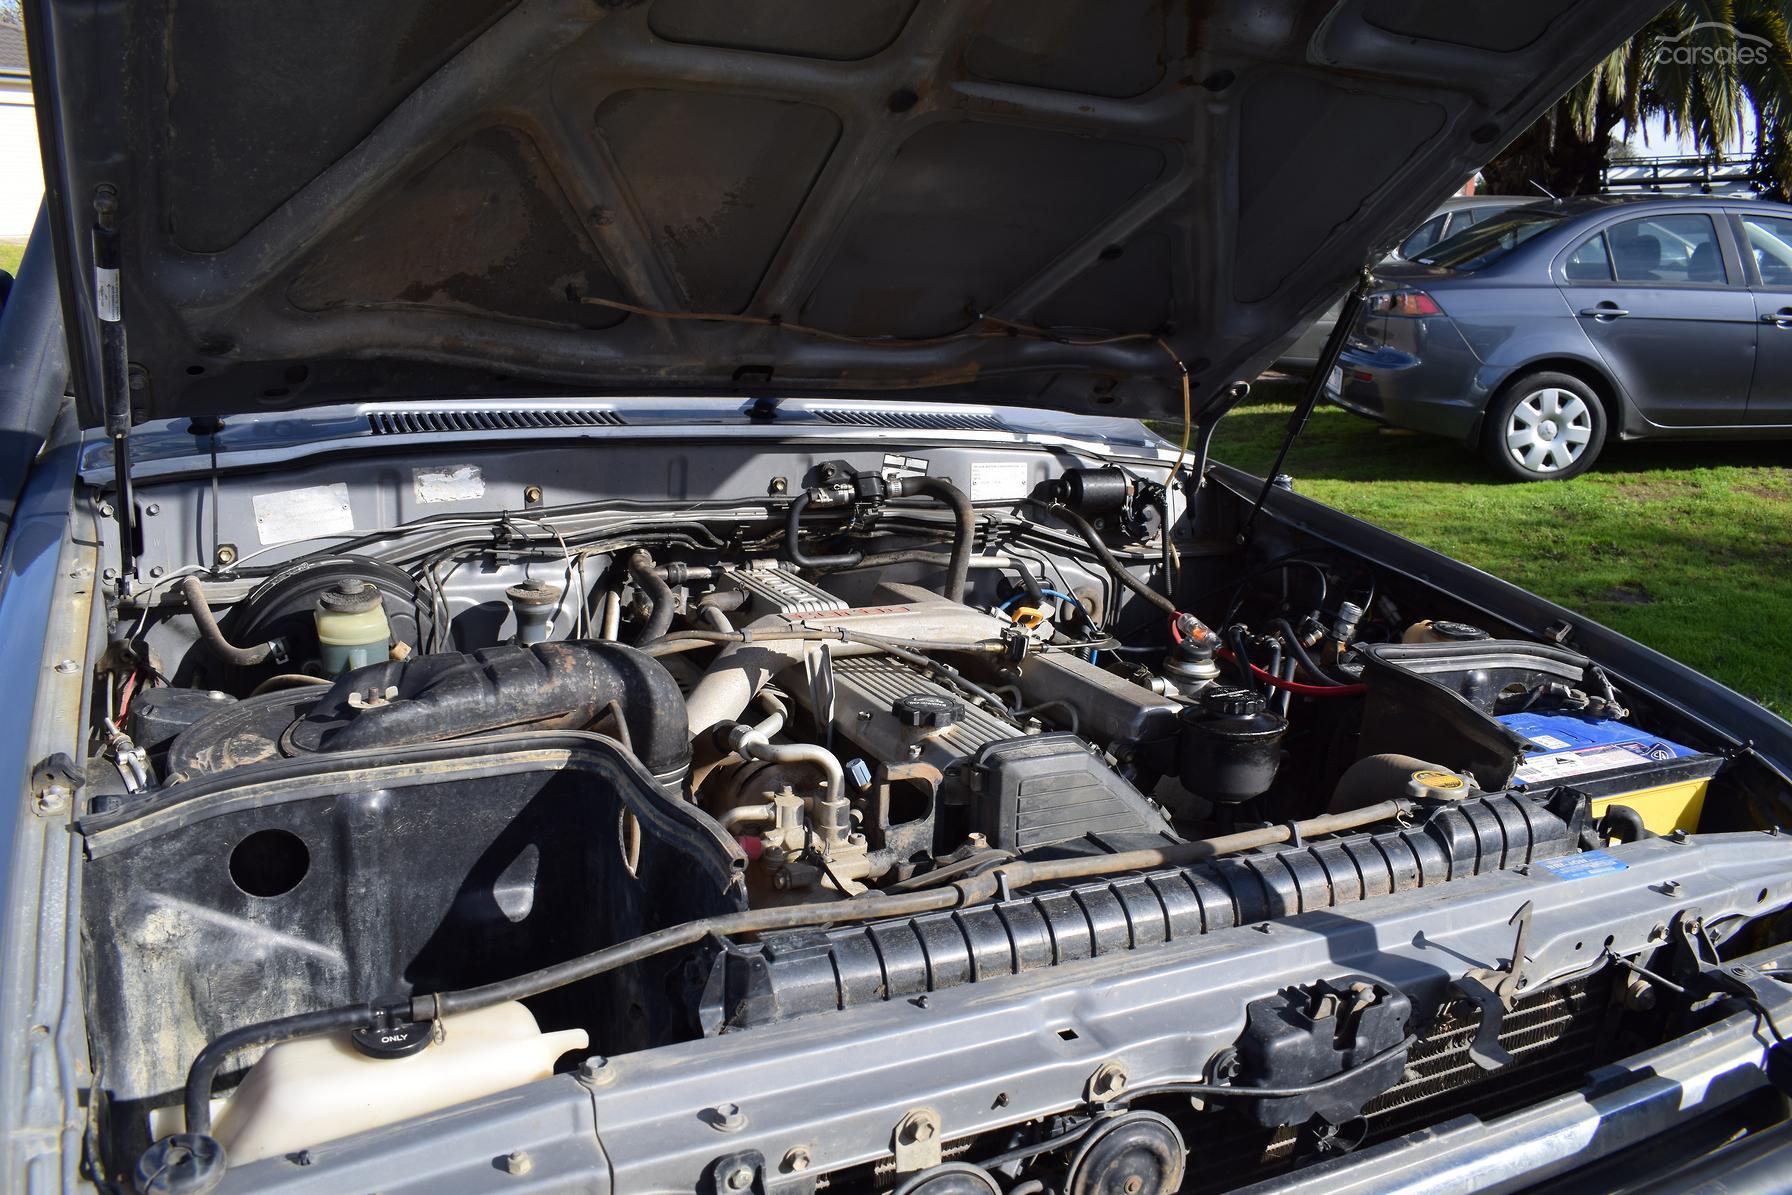 1991 Toyota Landcruiser GXL Manual 4x4-SSE-AD-6180315 - carsales com au